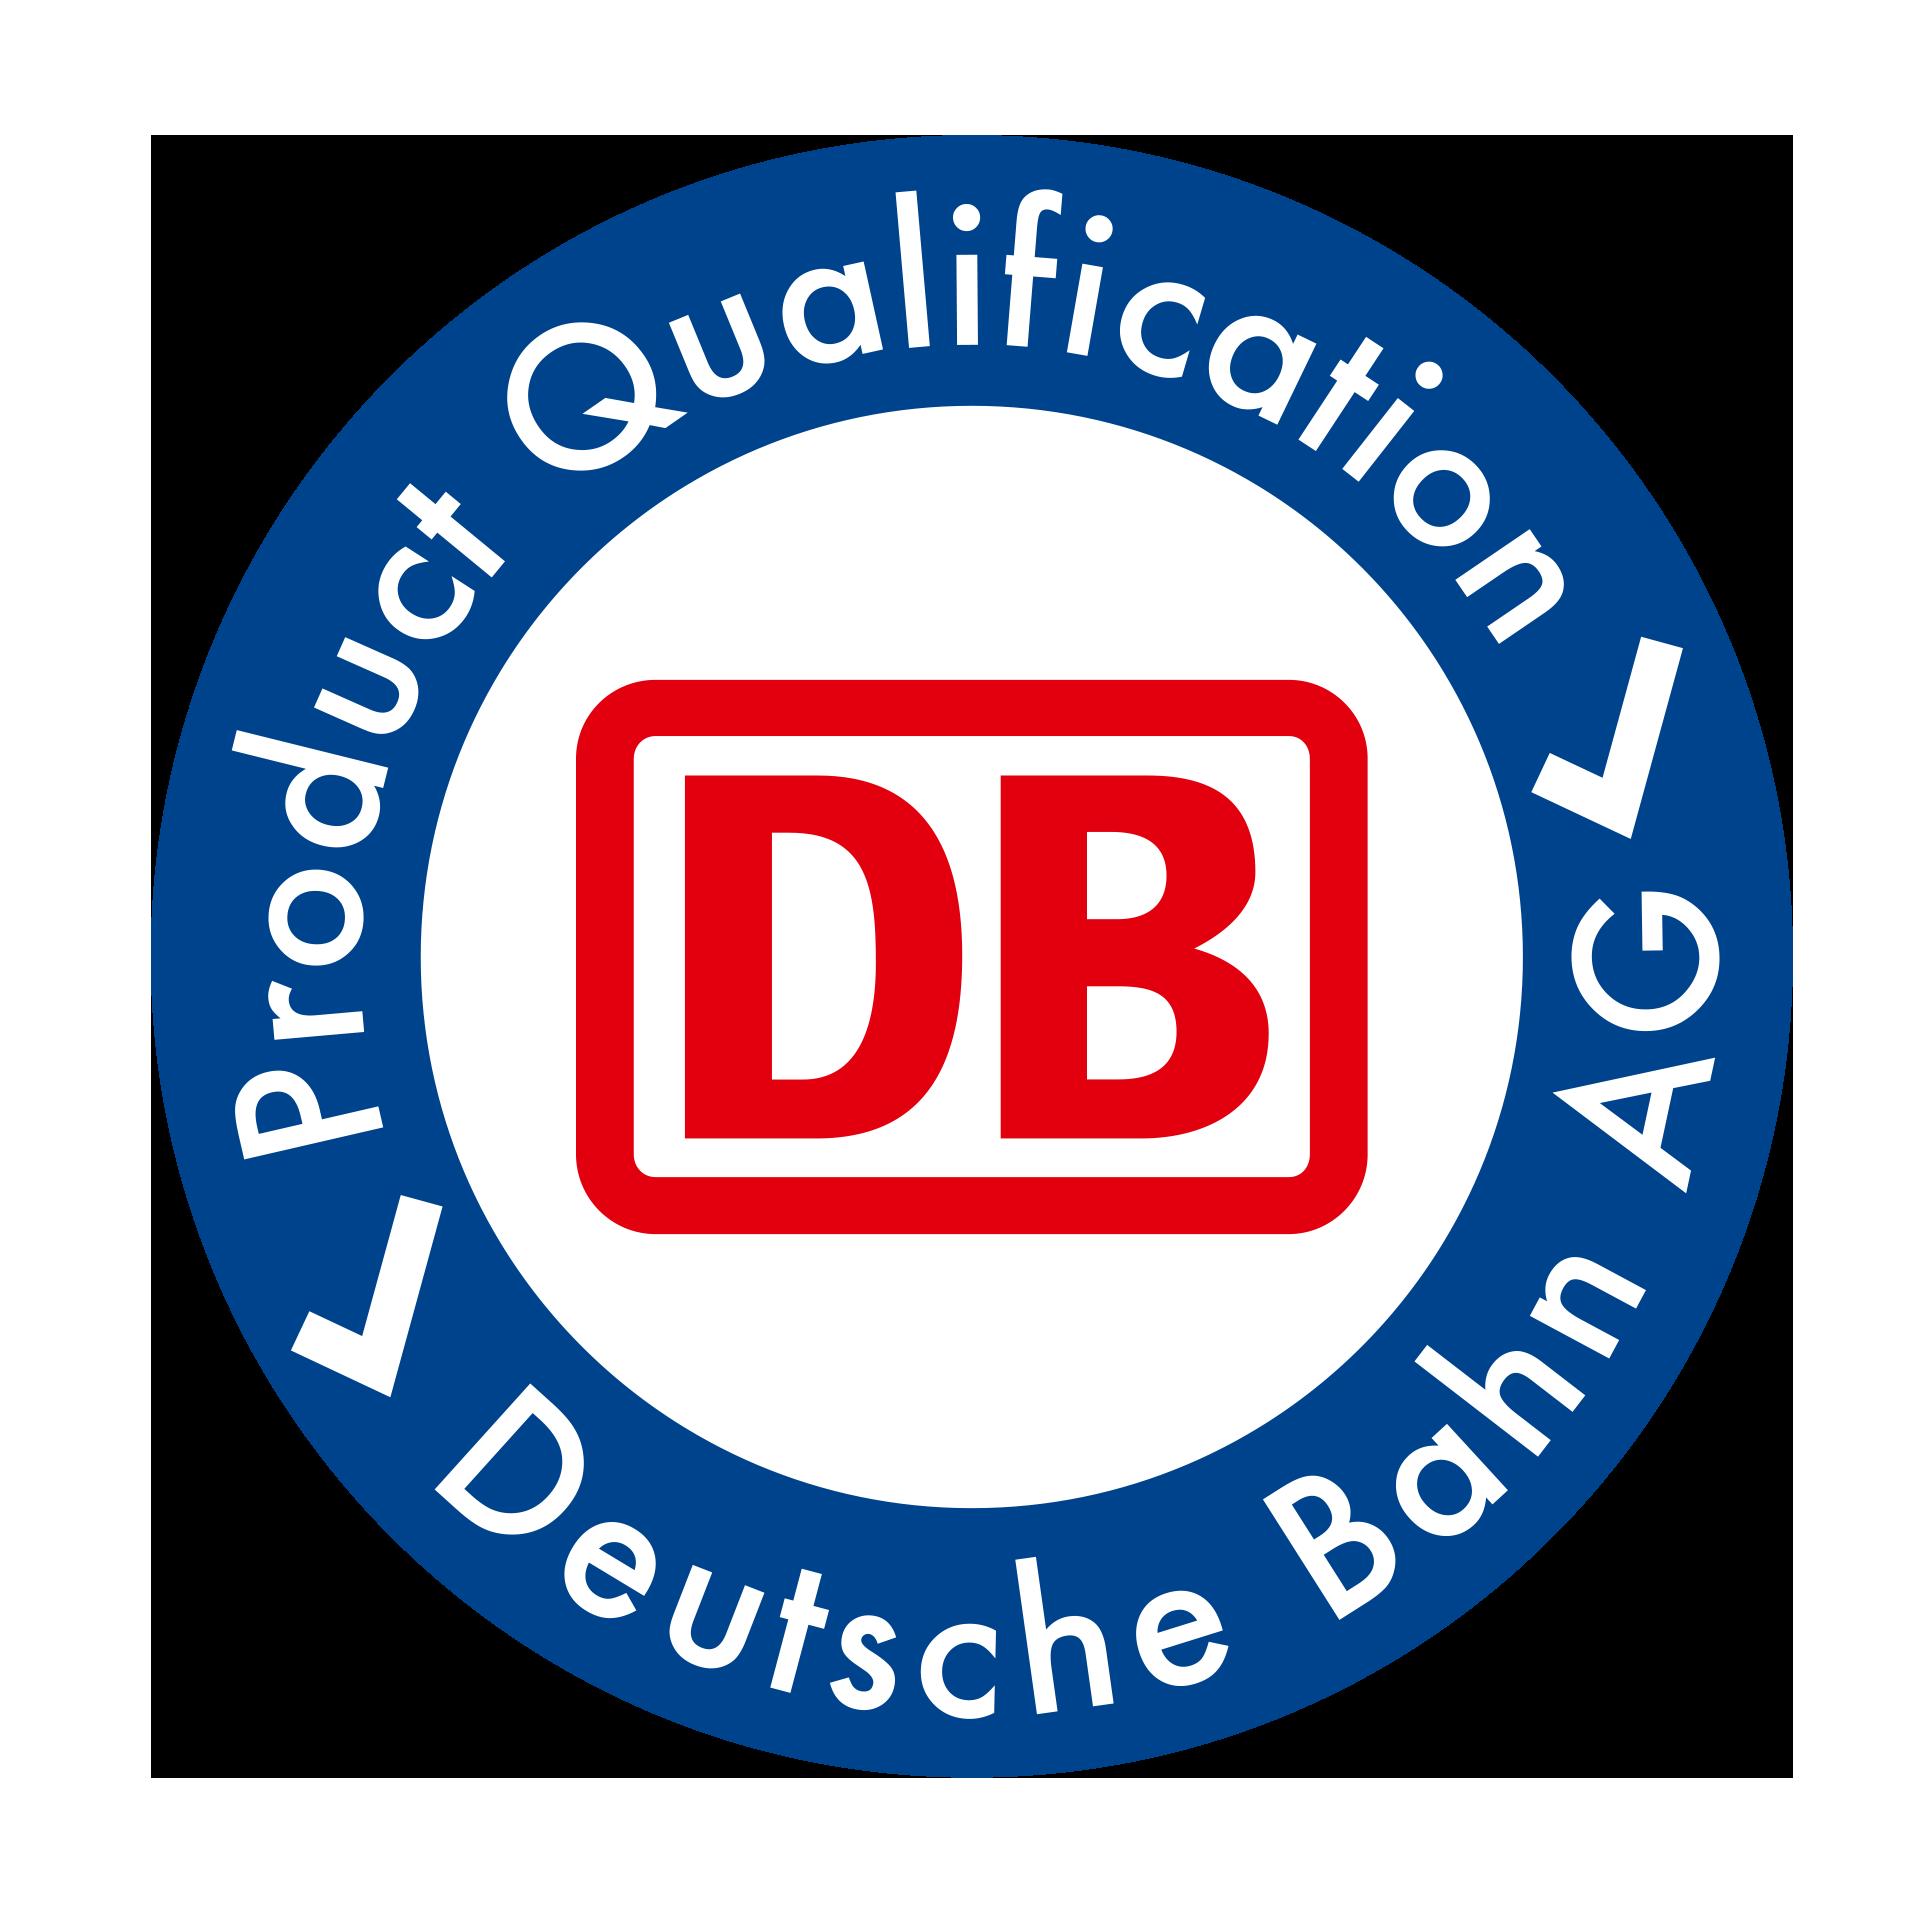 Productqualification Deutsche Bahn AG